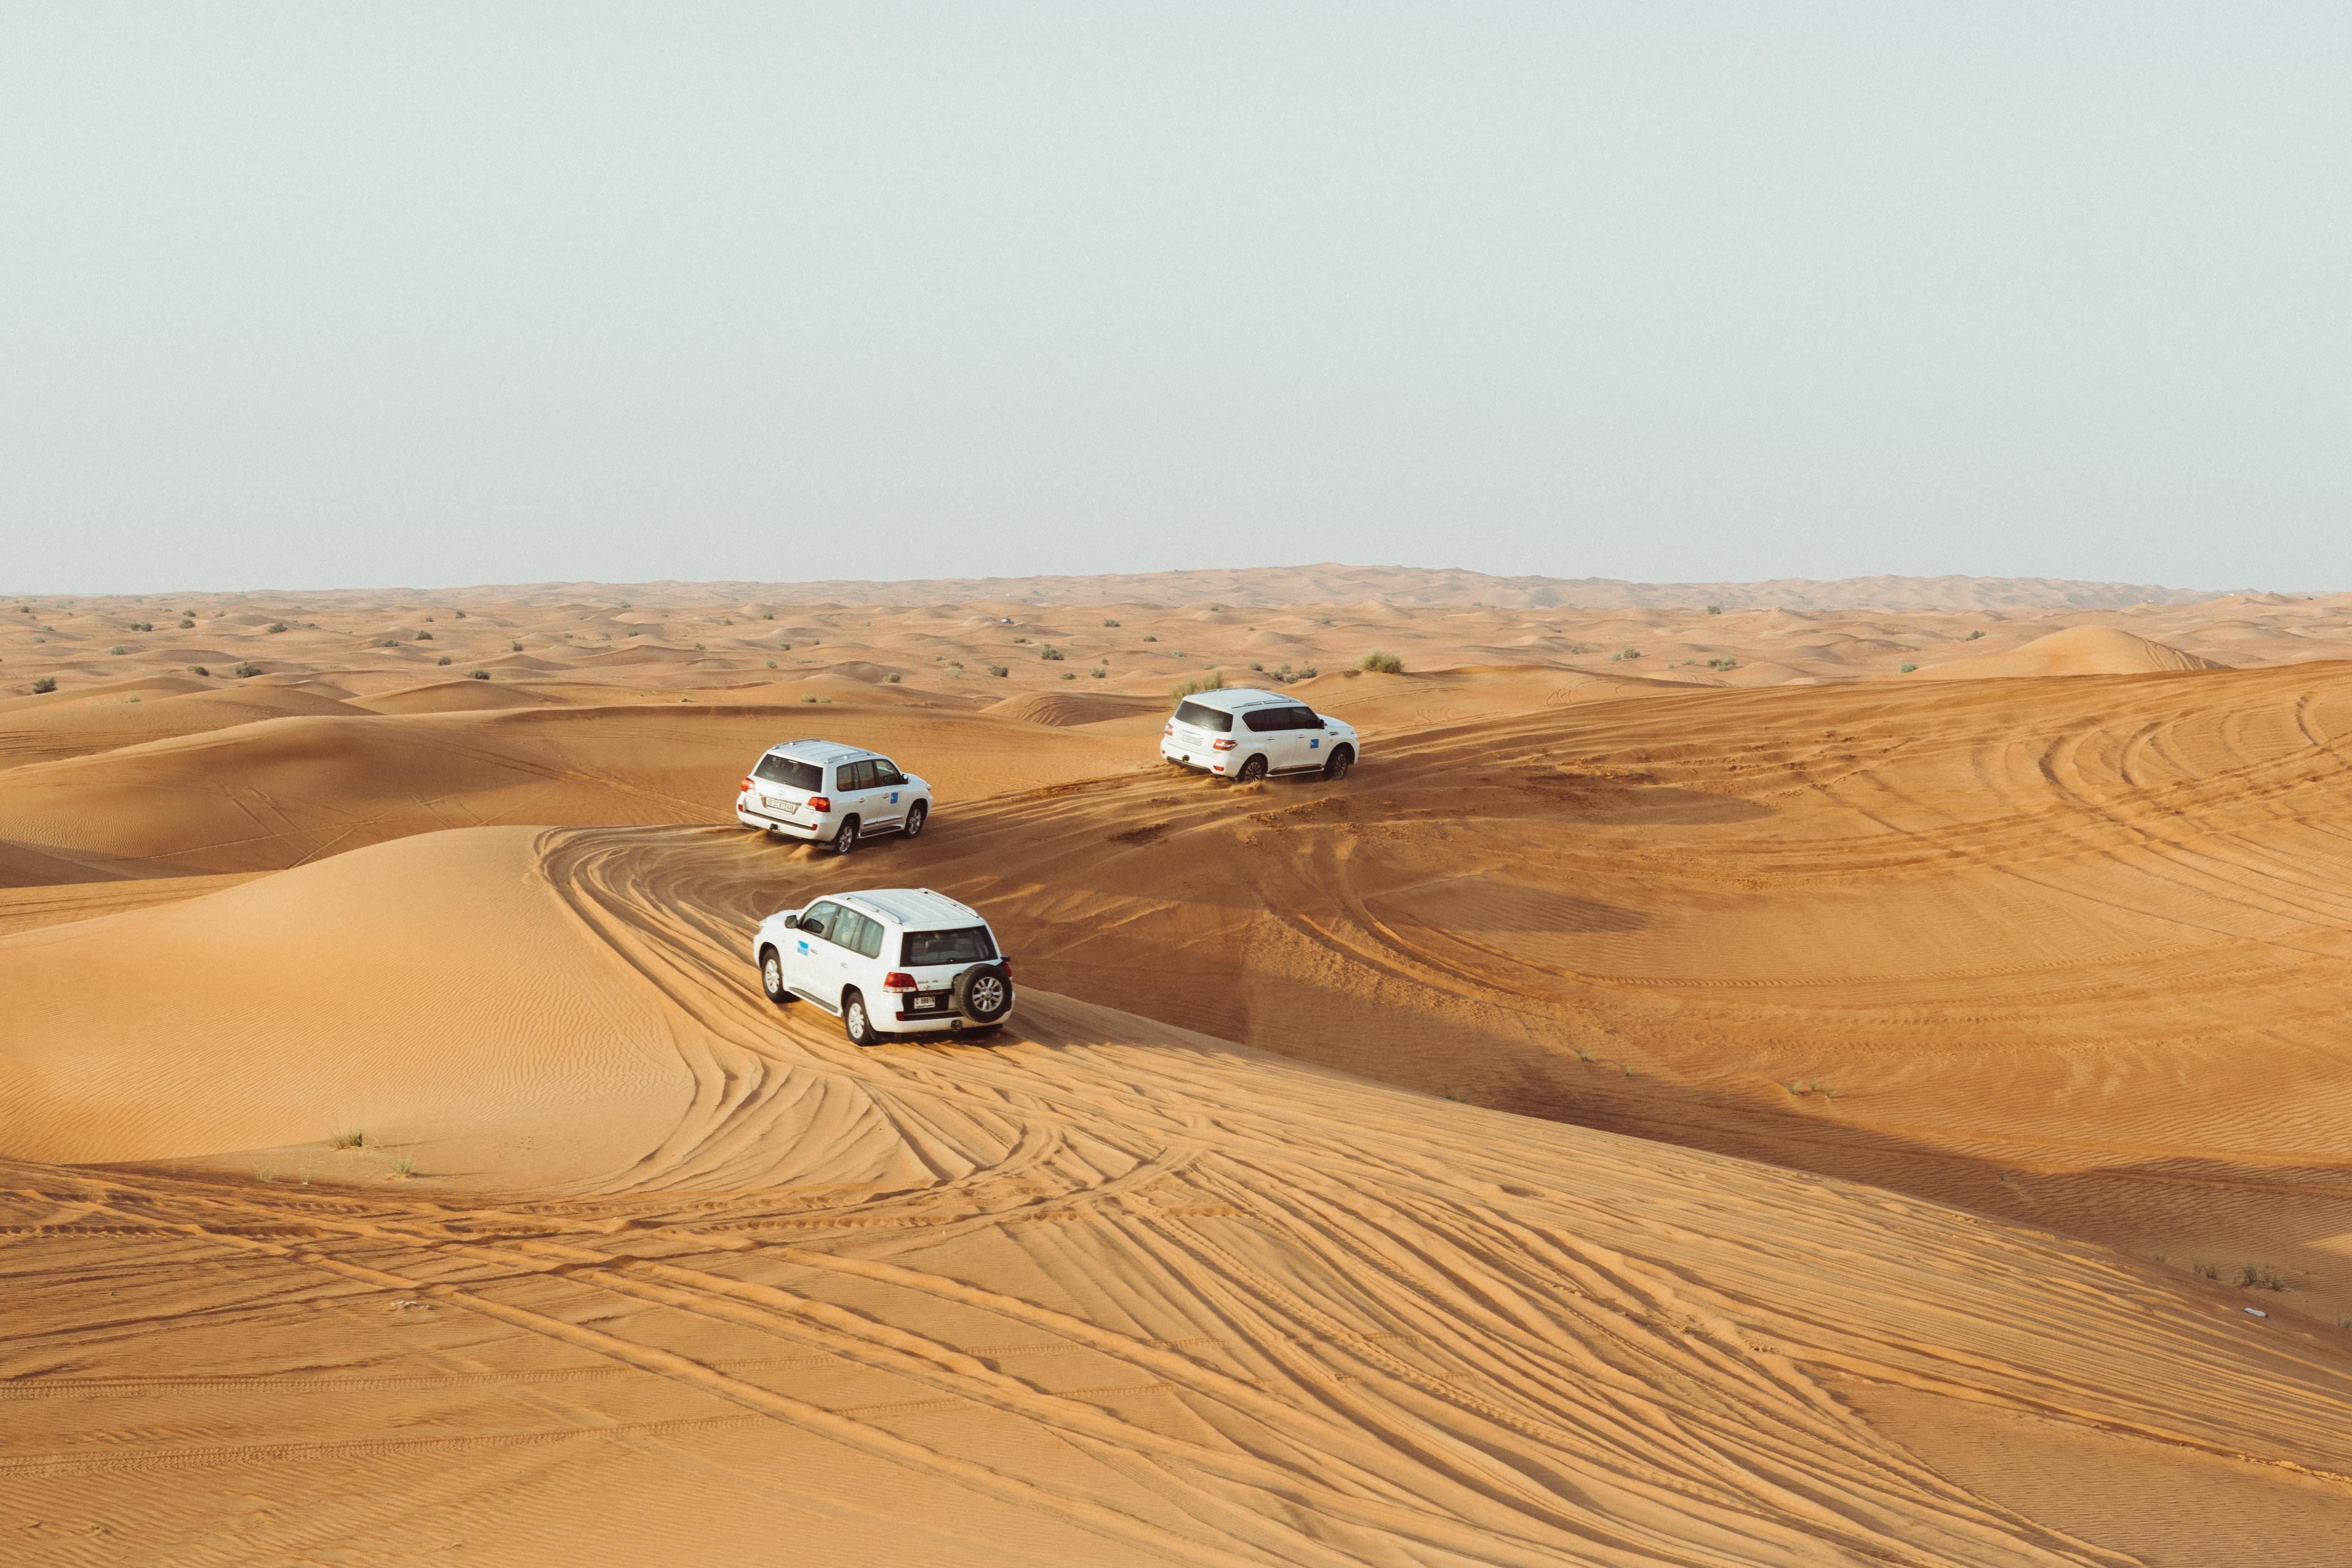 three white vehicles moving in desert under gray sky